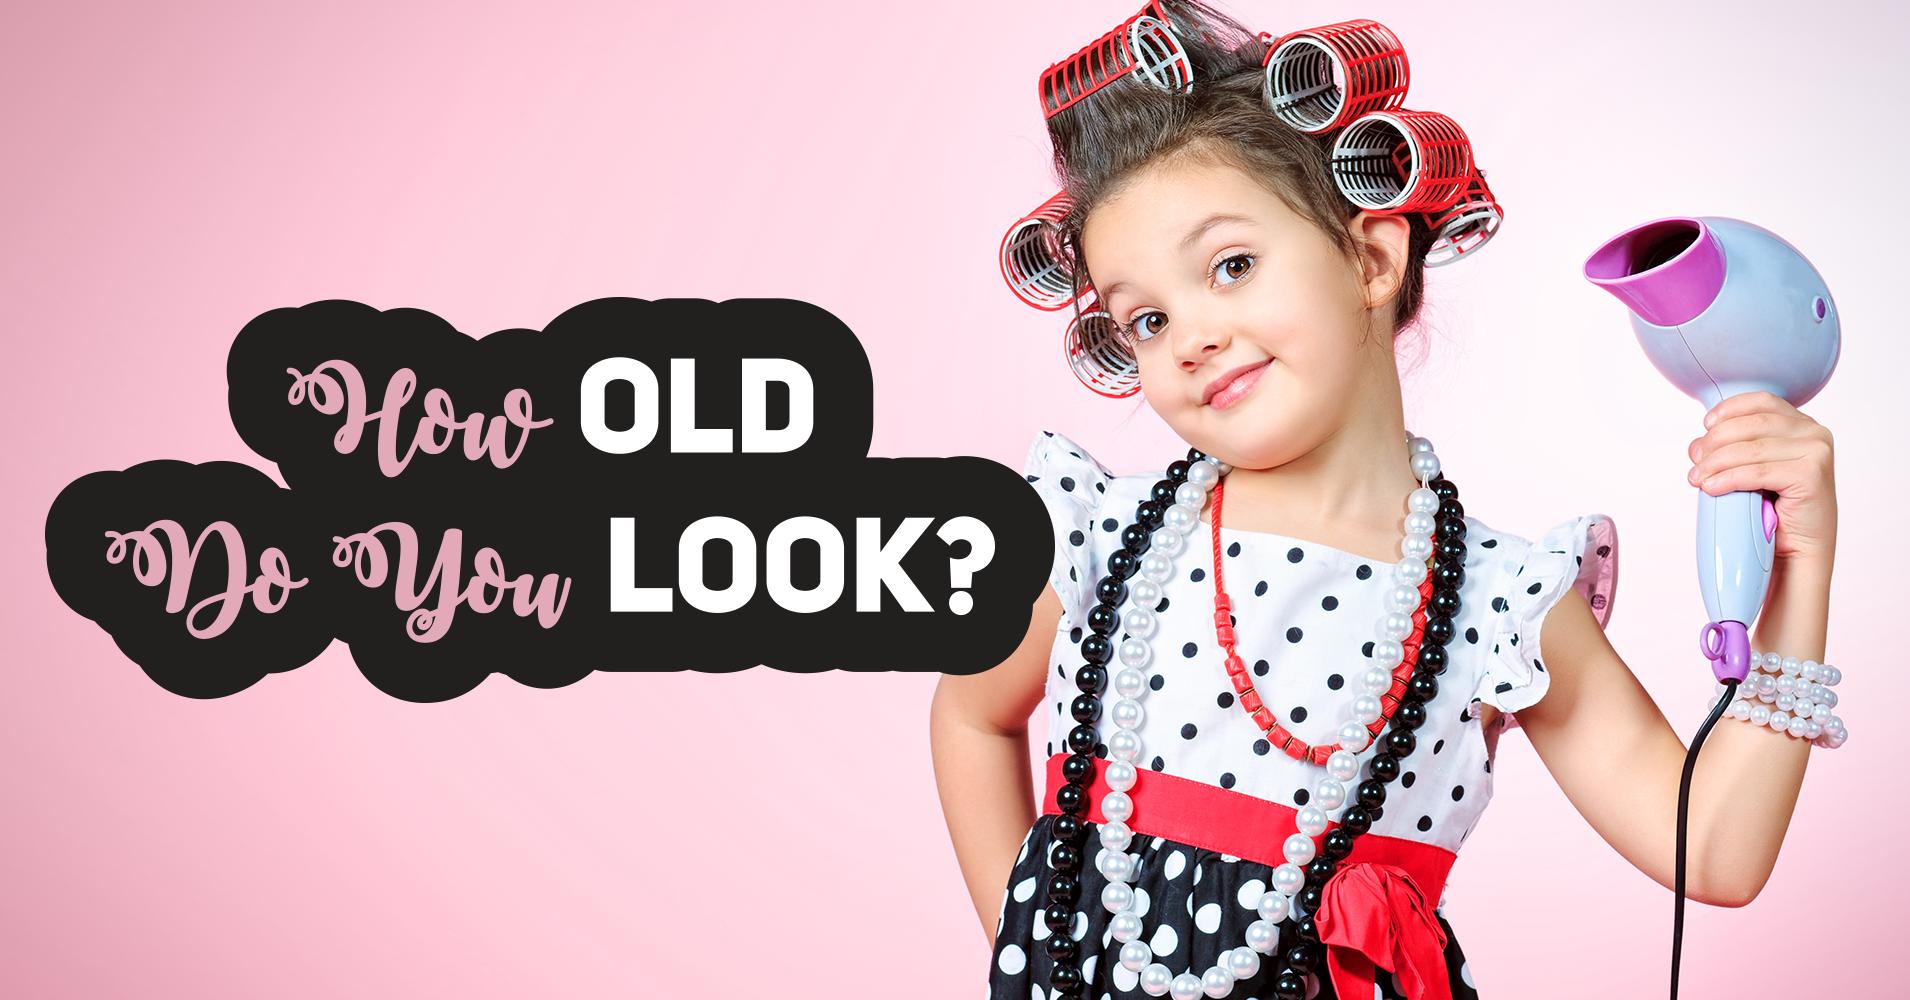 How Old Do You Look? - Quiz - Quizony.com